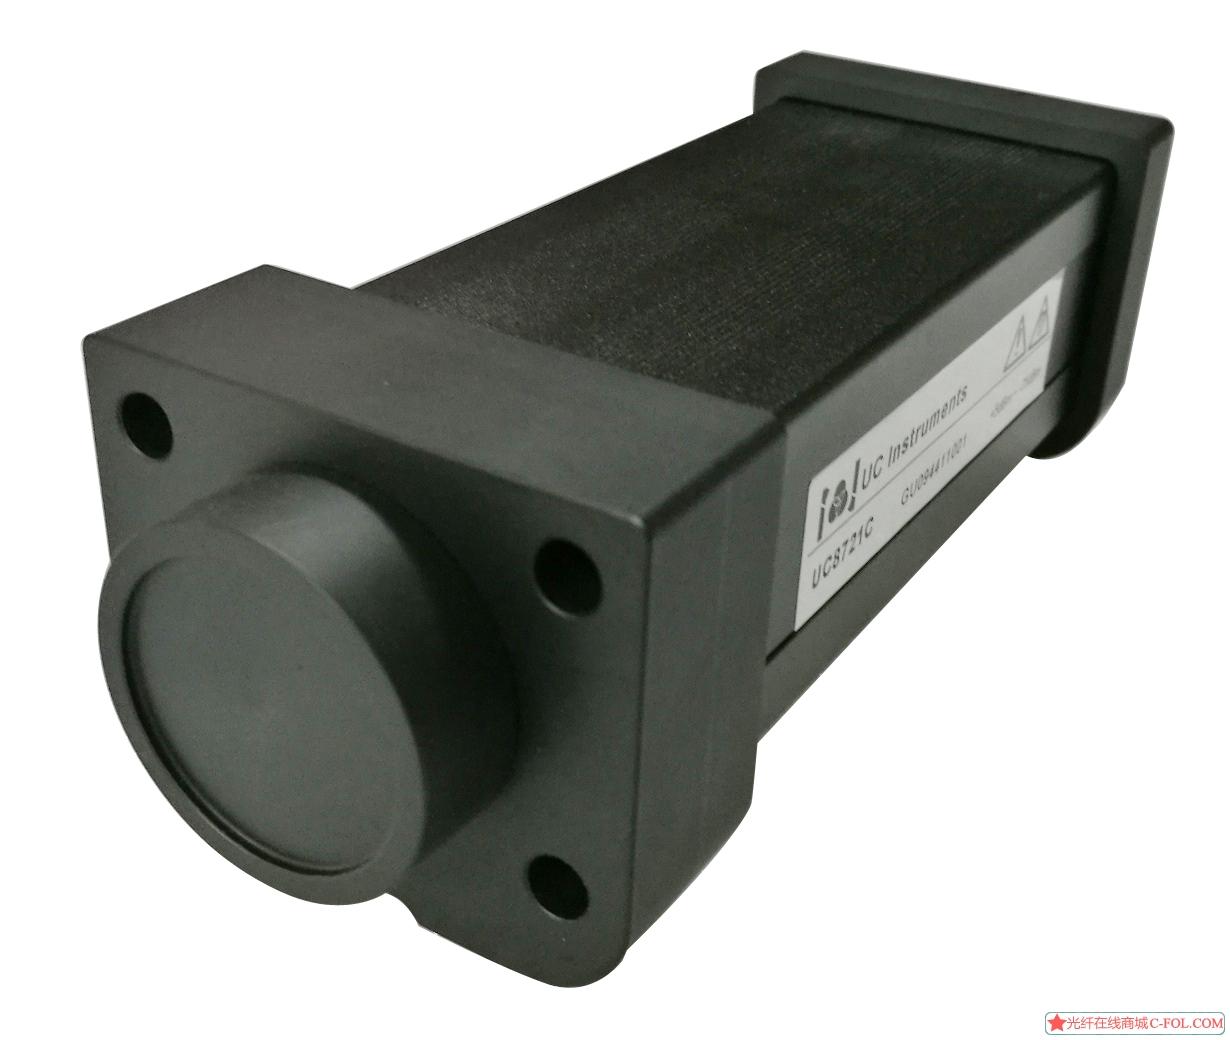 UC8721 USB 高速光功率计模块